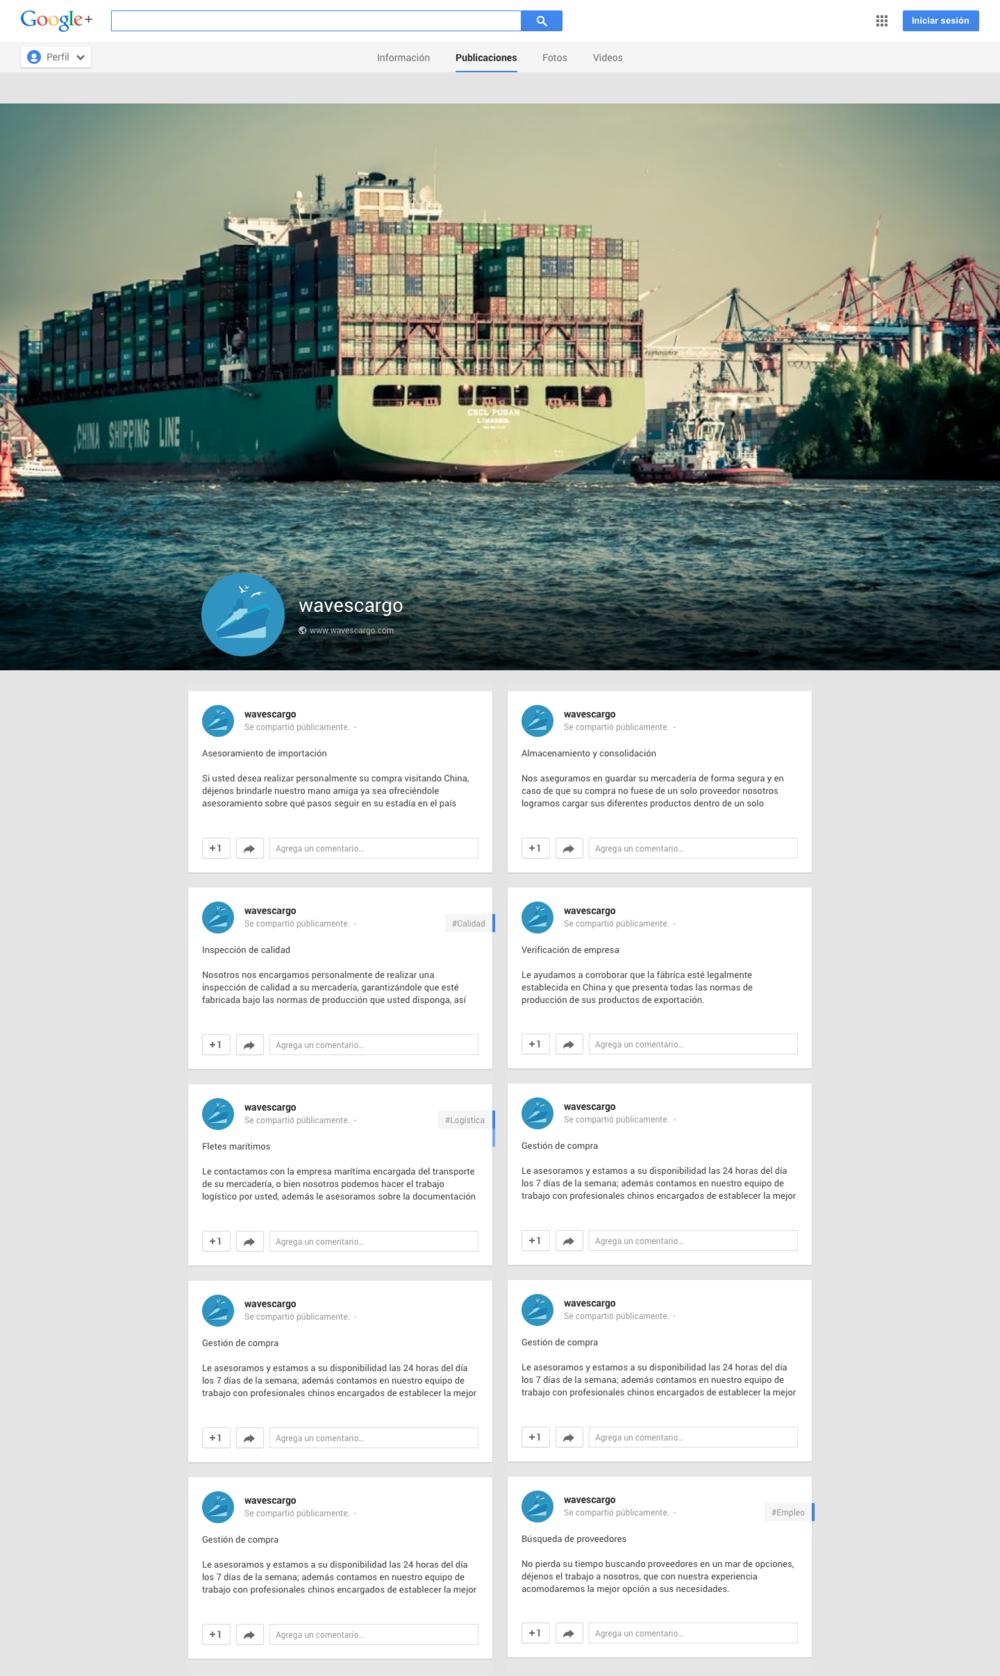 wavescargo - Google+.png